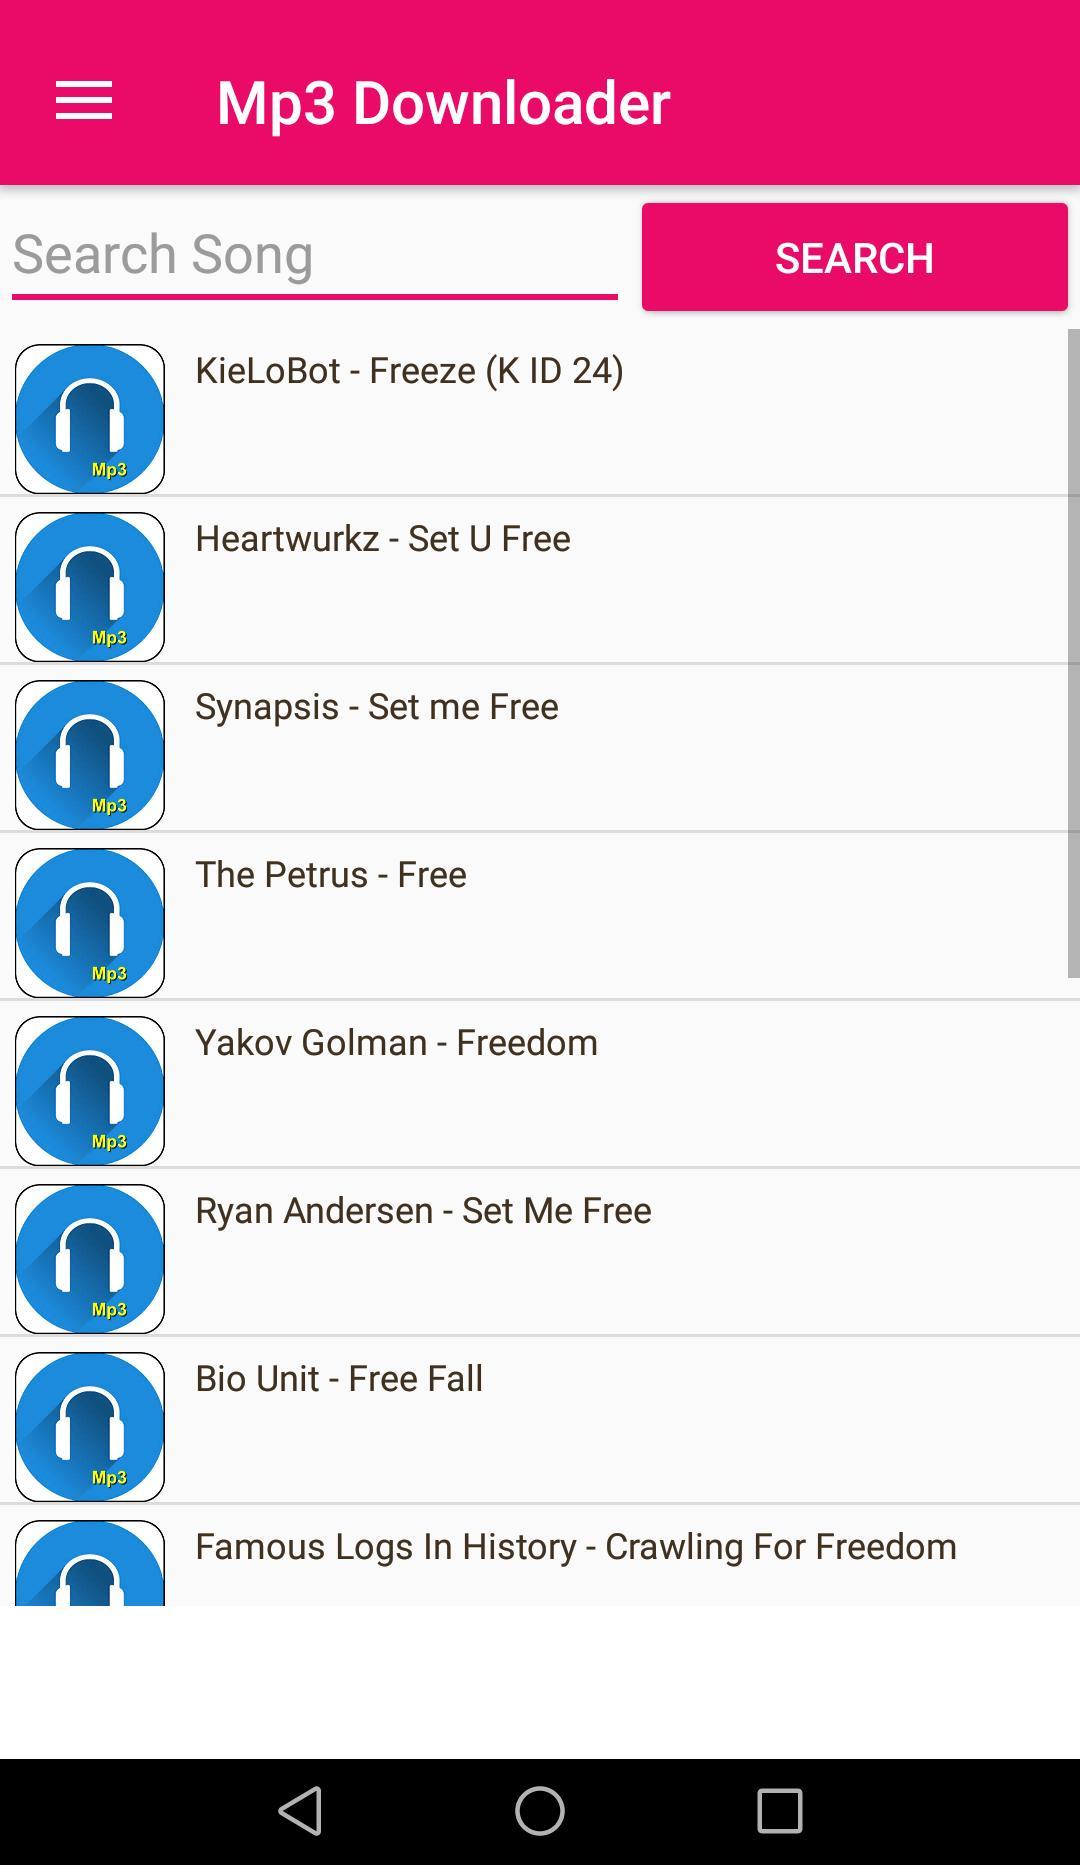 free music downloader gratis en espa?ol